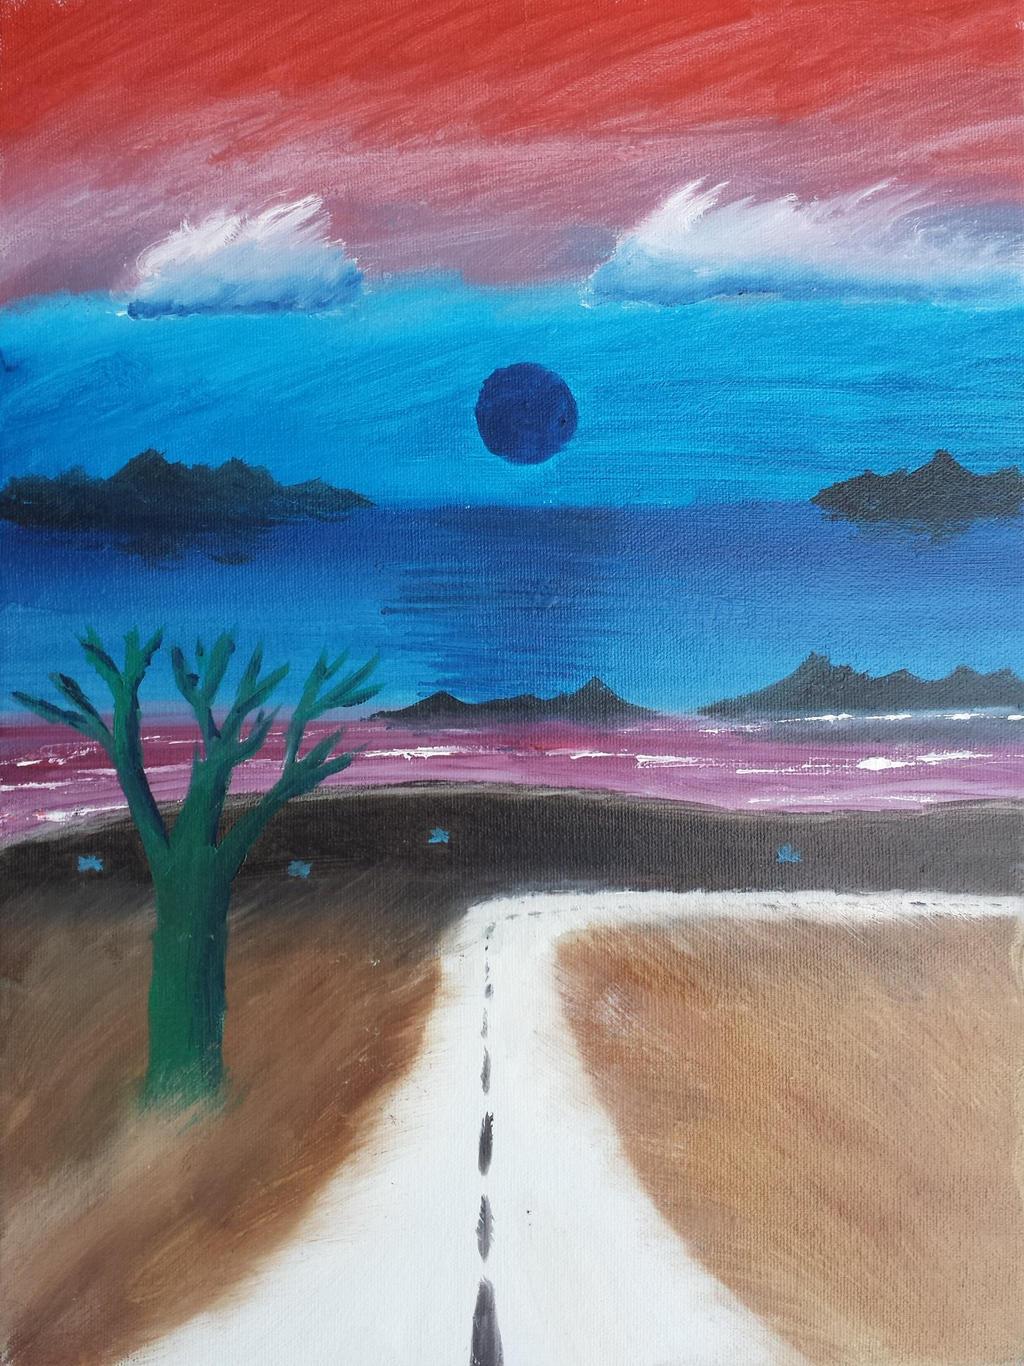 Miscolored Landscape